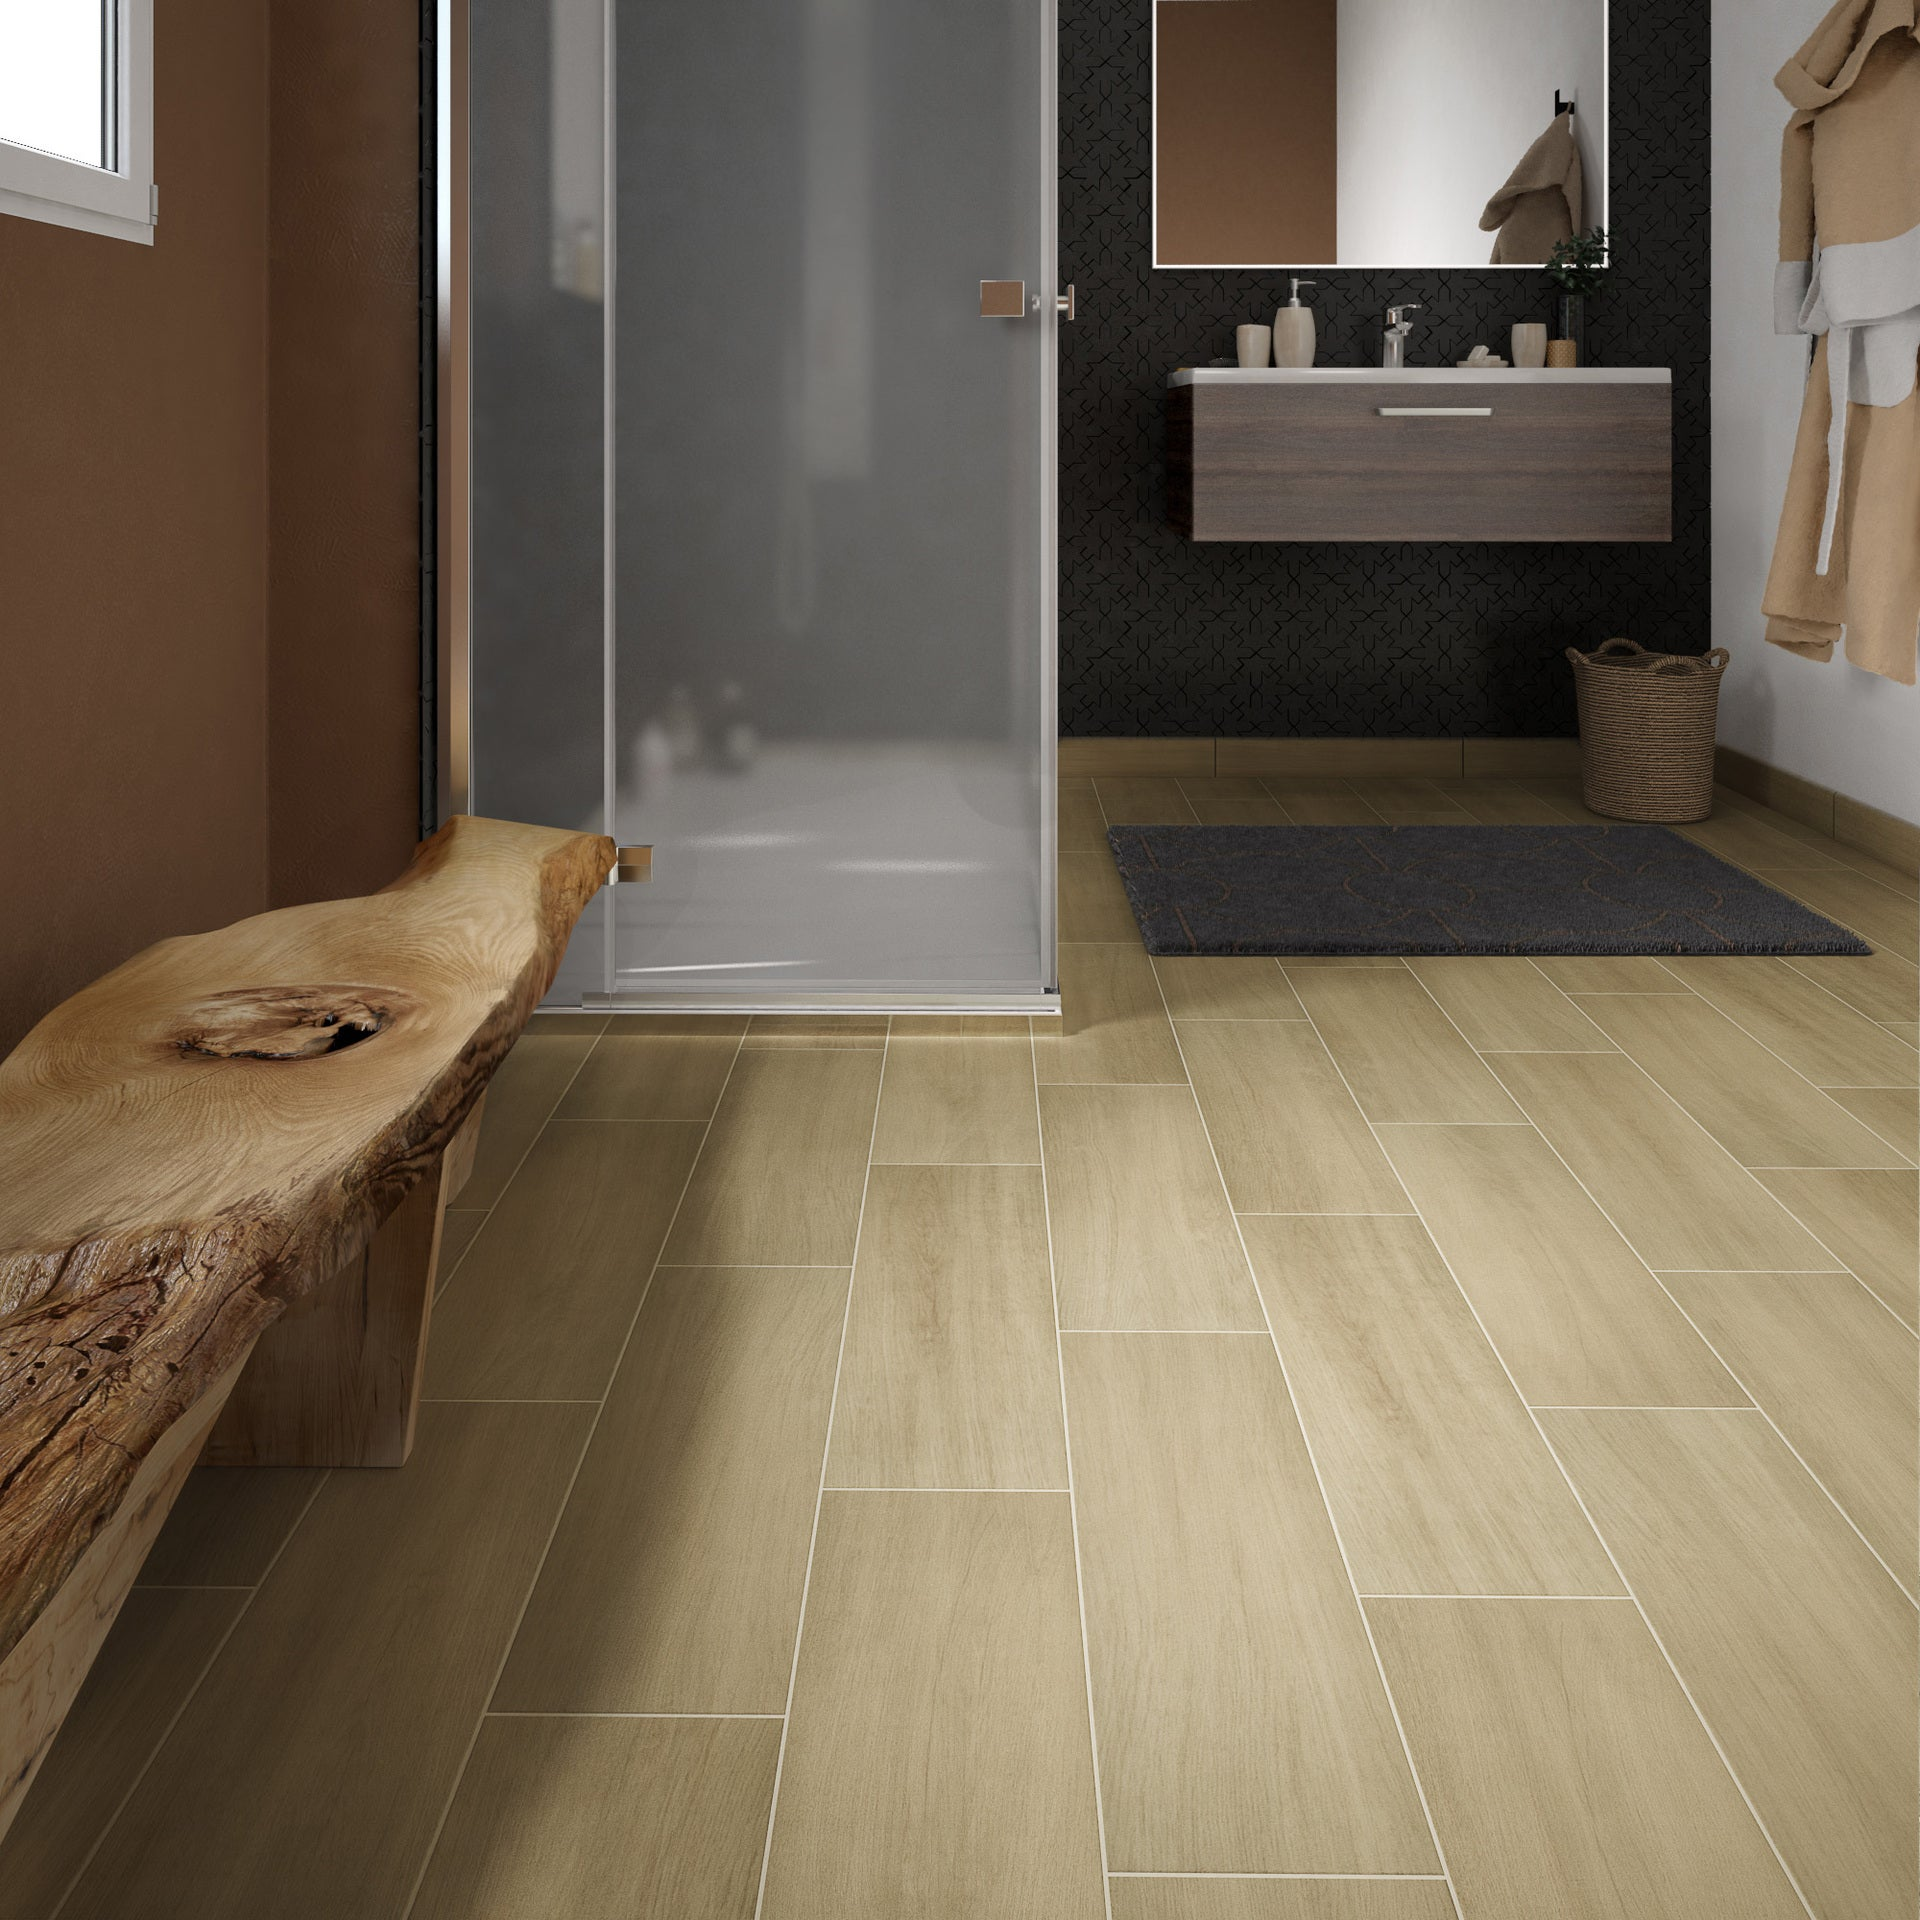 carrelage sol et mur intenso effet bois beige clair helsinka l 20 x l 60 cm